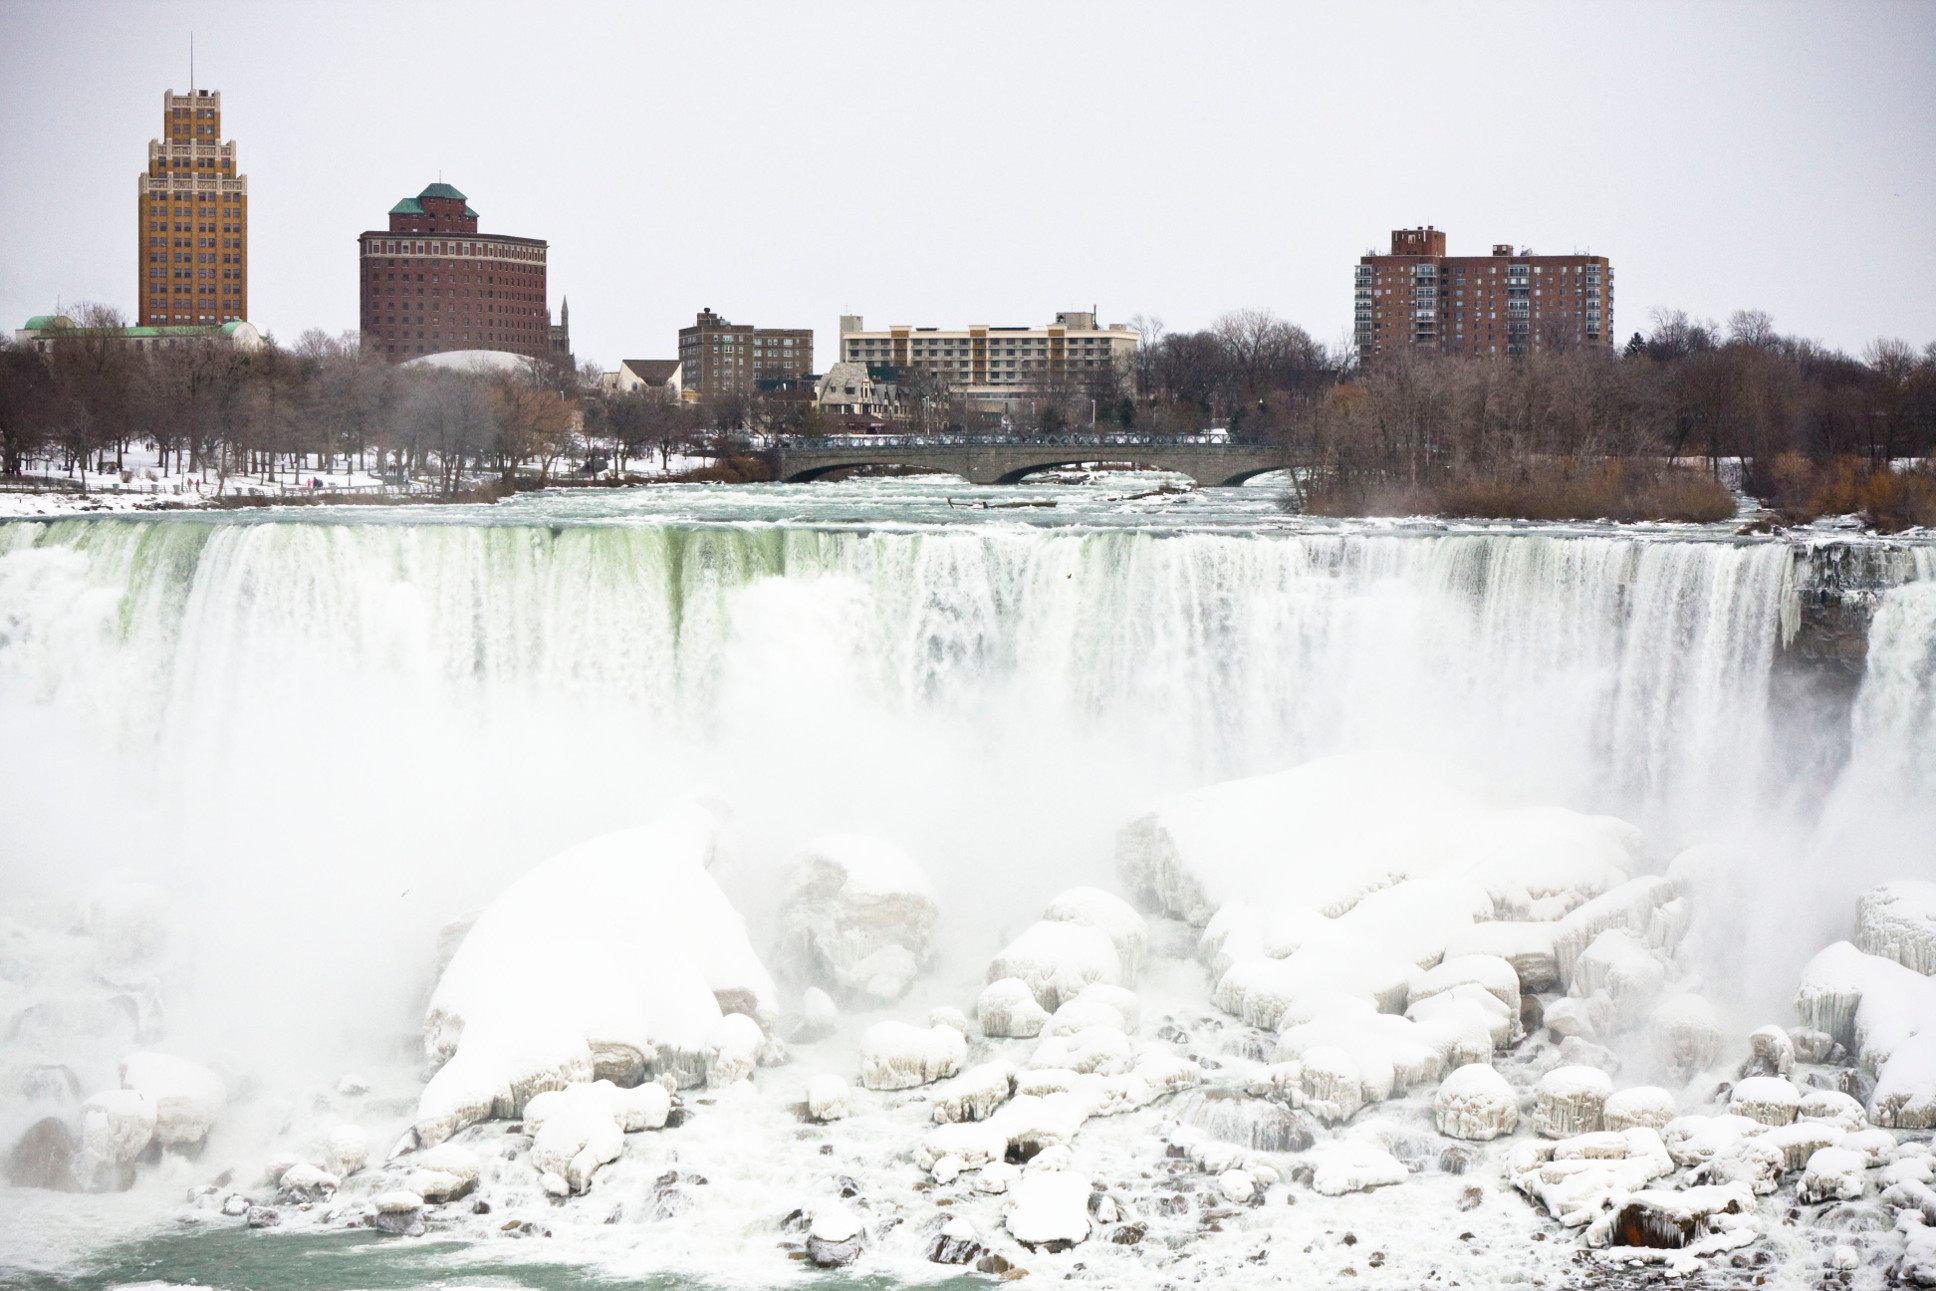 Toronto and Niagara falls